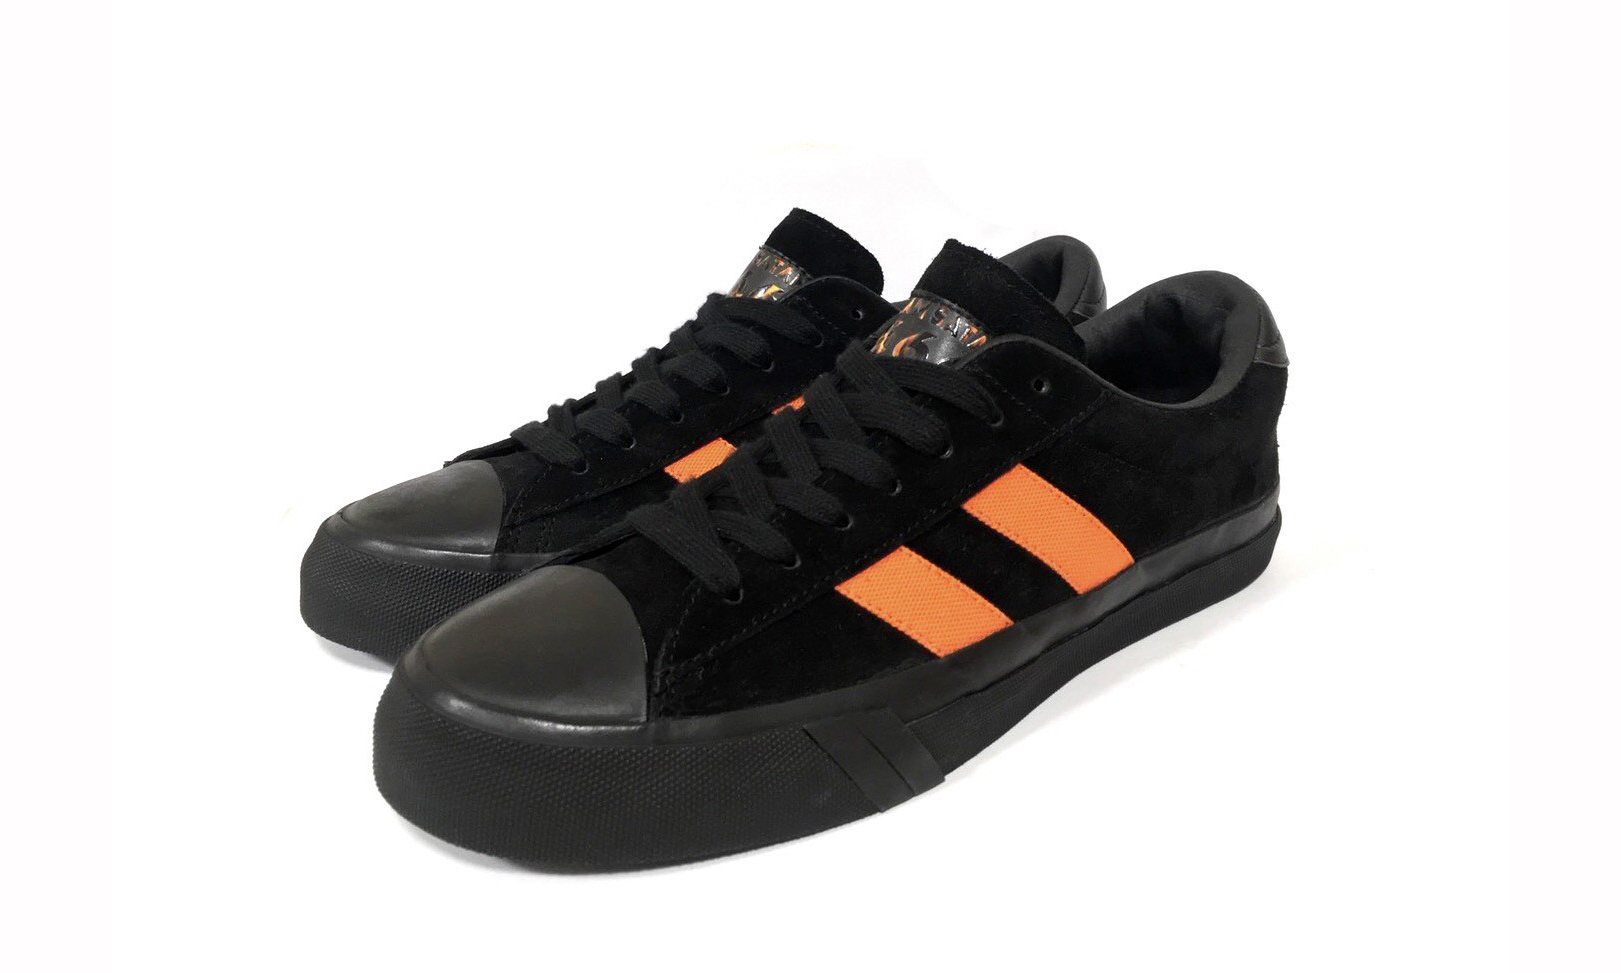 TEAM SATAN SKATEBOARDING x PRO-Keds 打造联名鞋款